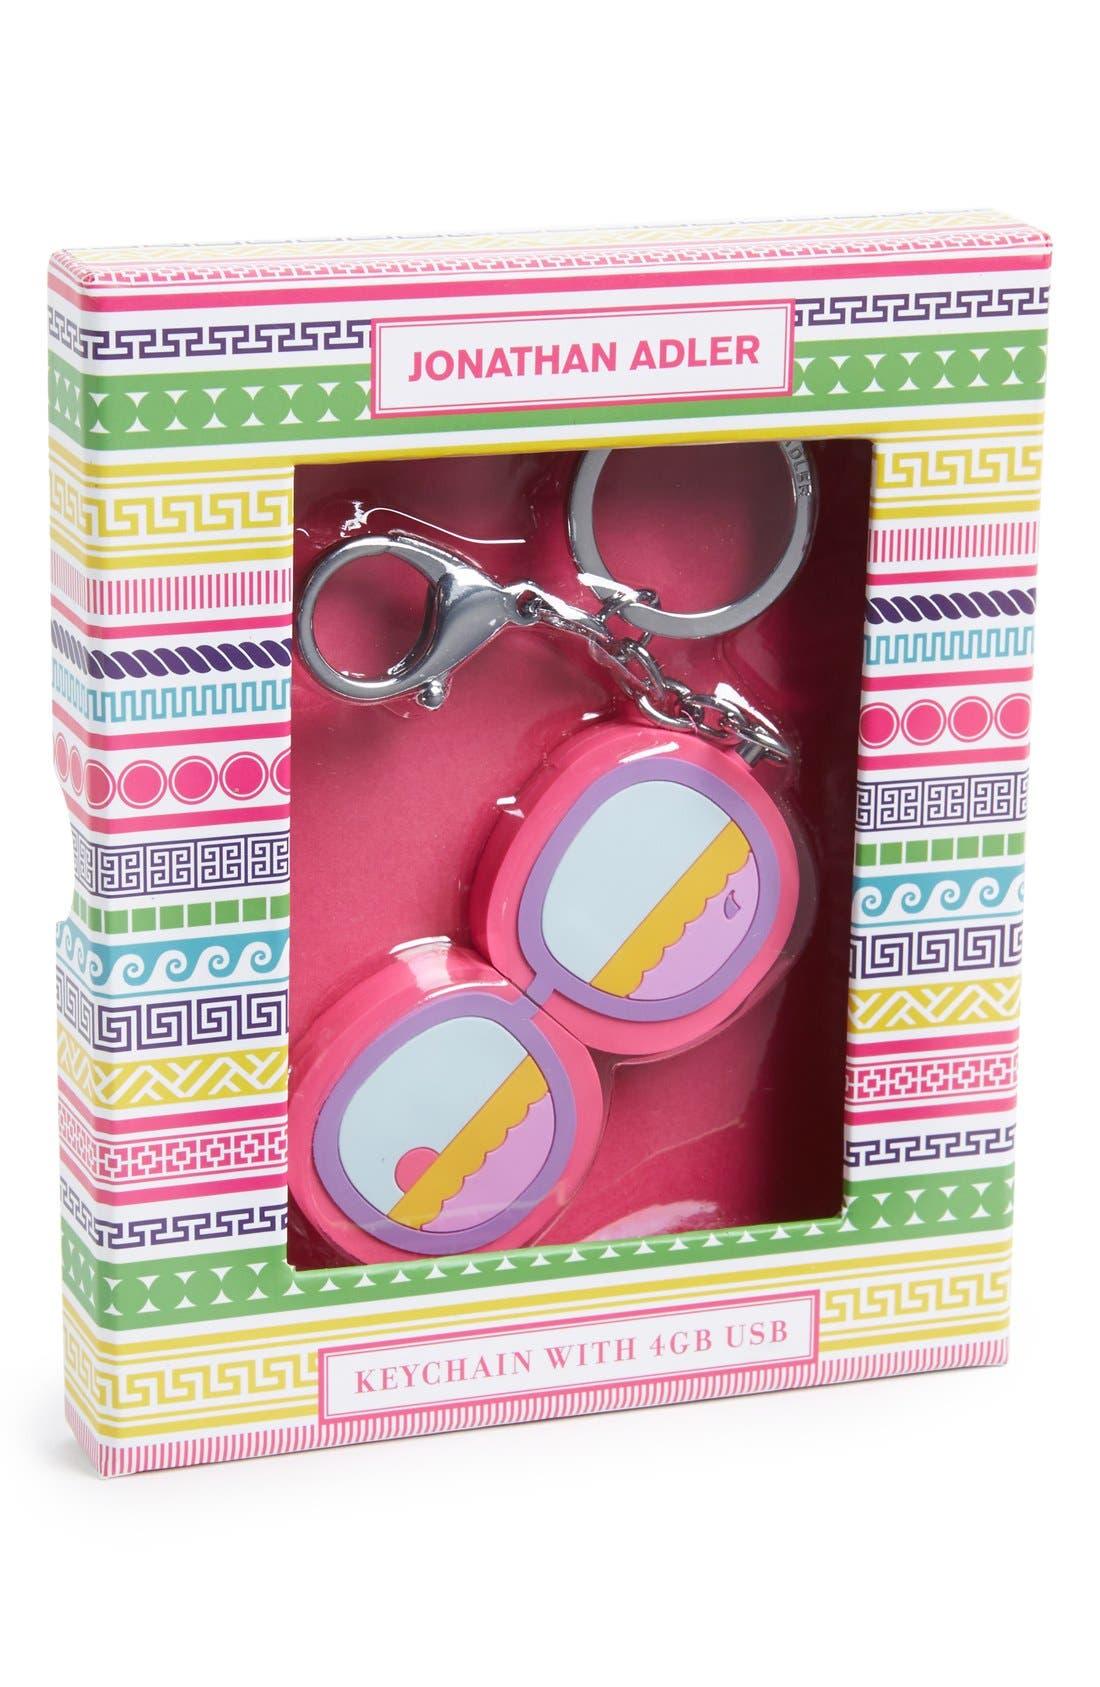 Alternate Image 1 Selected - Jonathan Adler 'Sunglasses' USB Flash Drive Key Chain